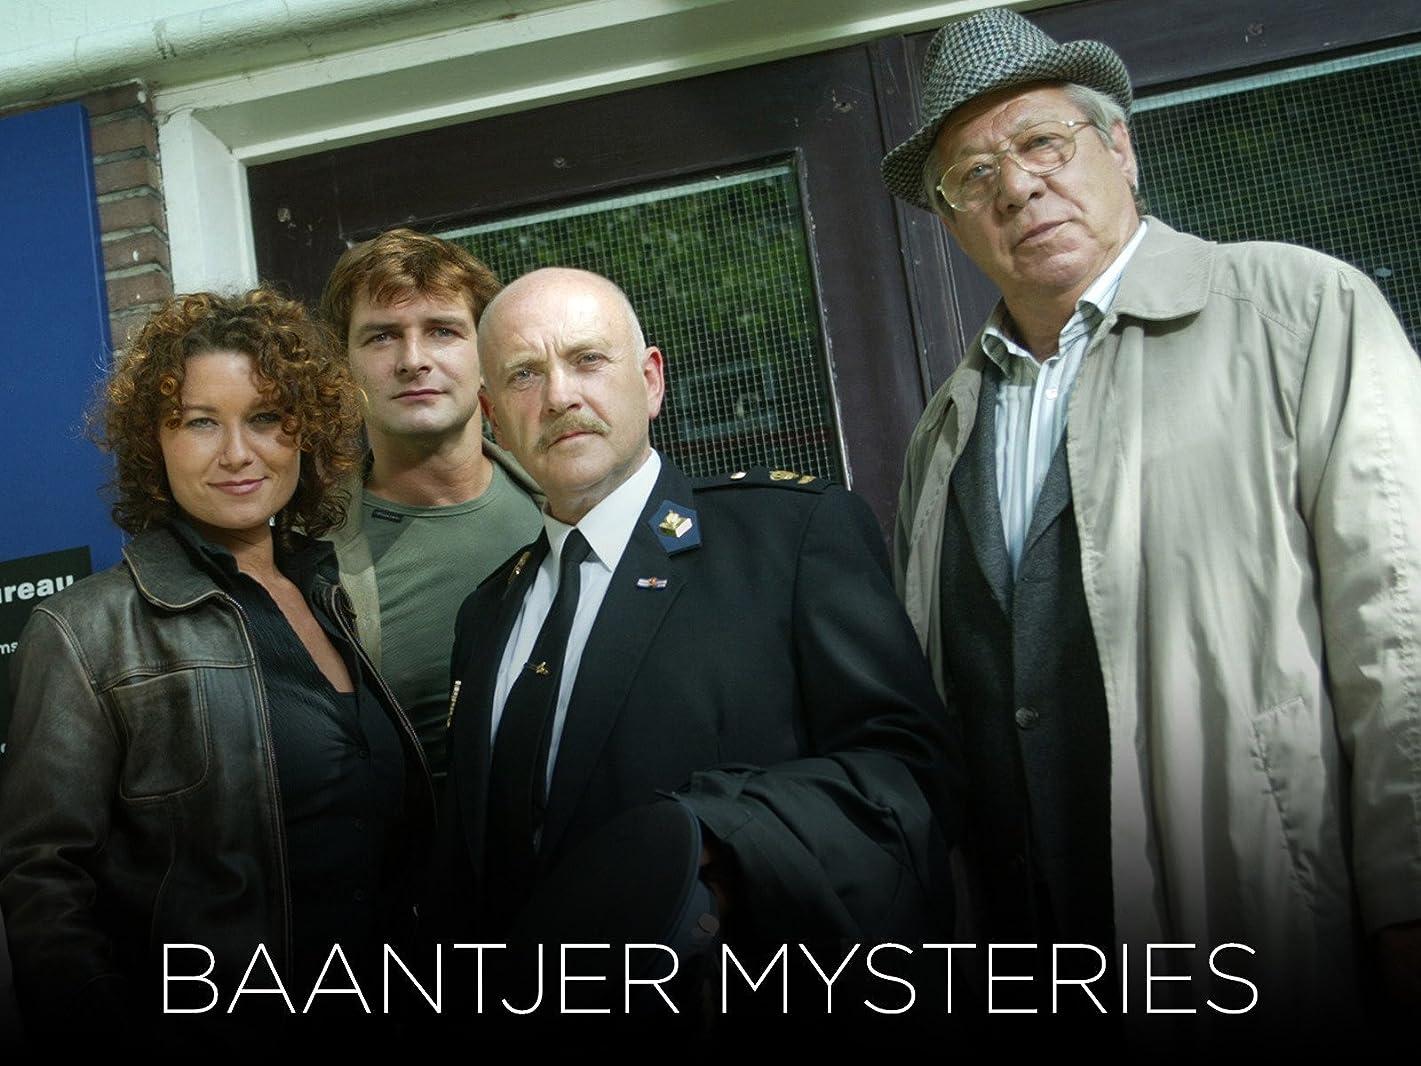 Baantjer Mysteries